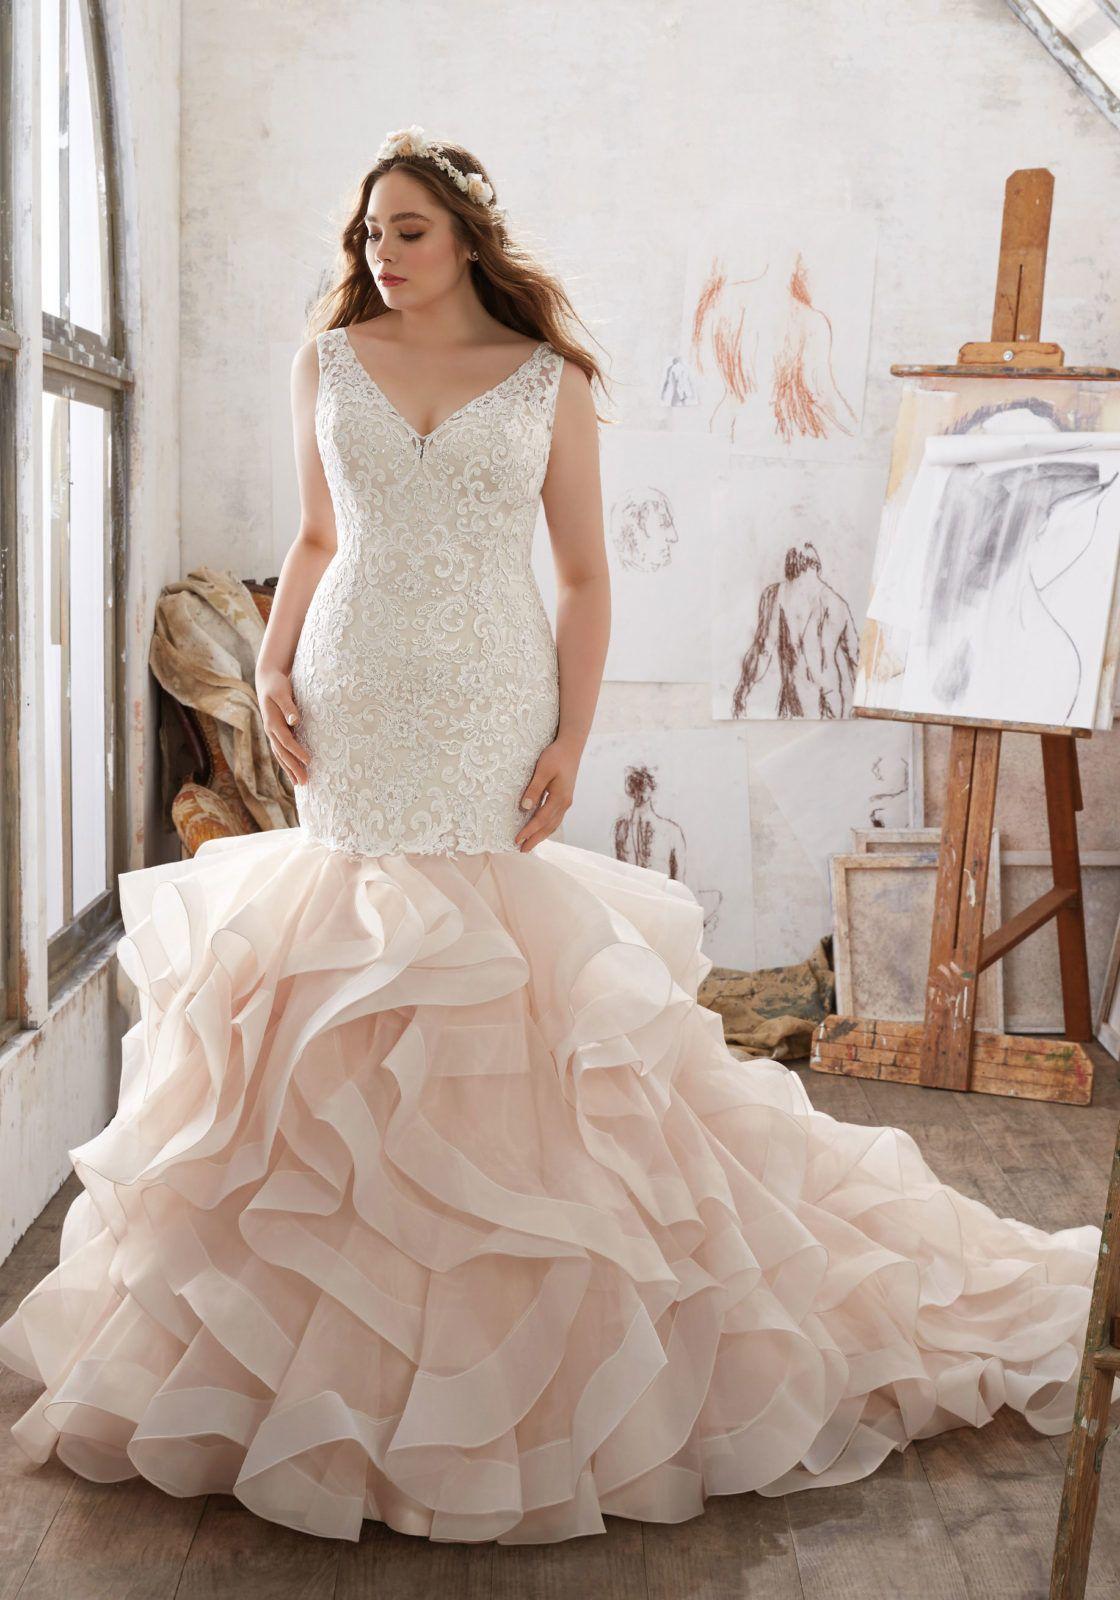 Mildred Plus Size Wedding Dress Plus Size Wedding Gowns Wedding Dress Styles Wedding Dresses [ 1600 x 1120 Pixel ]